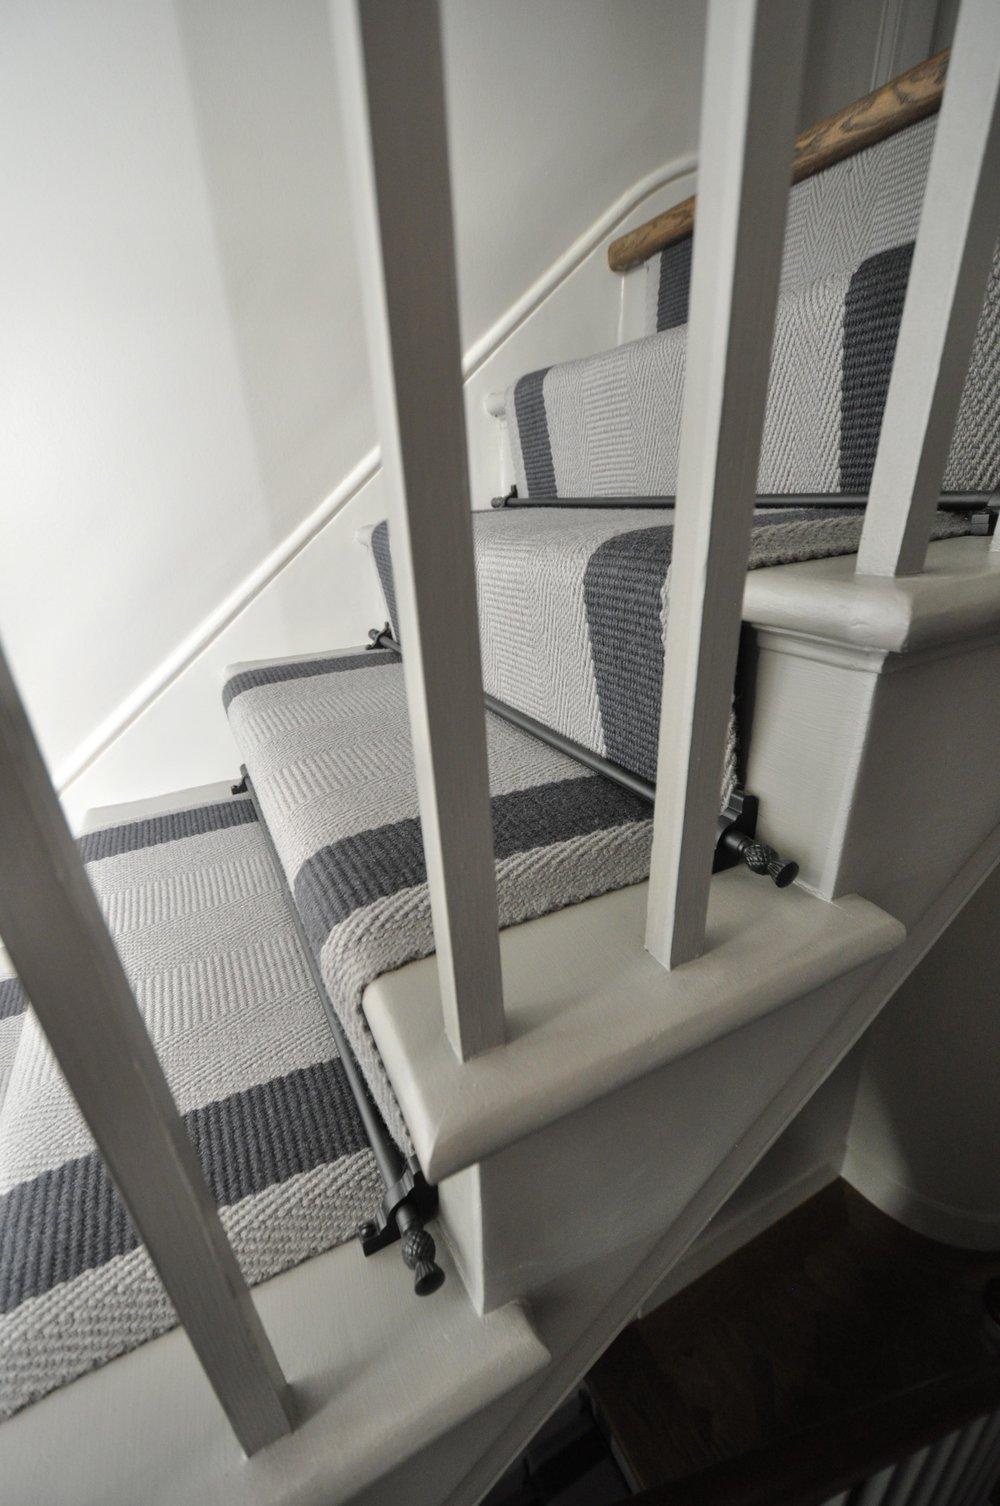 flatweave-stair-runner-london-bowloom-off-the-loom-geometric-carpet-DSC_1136.jpg